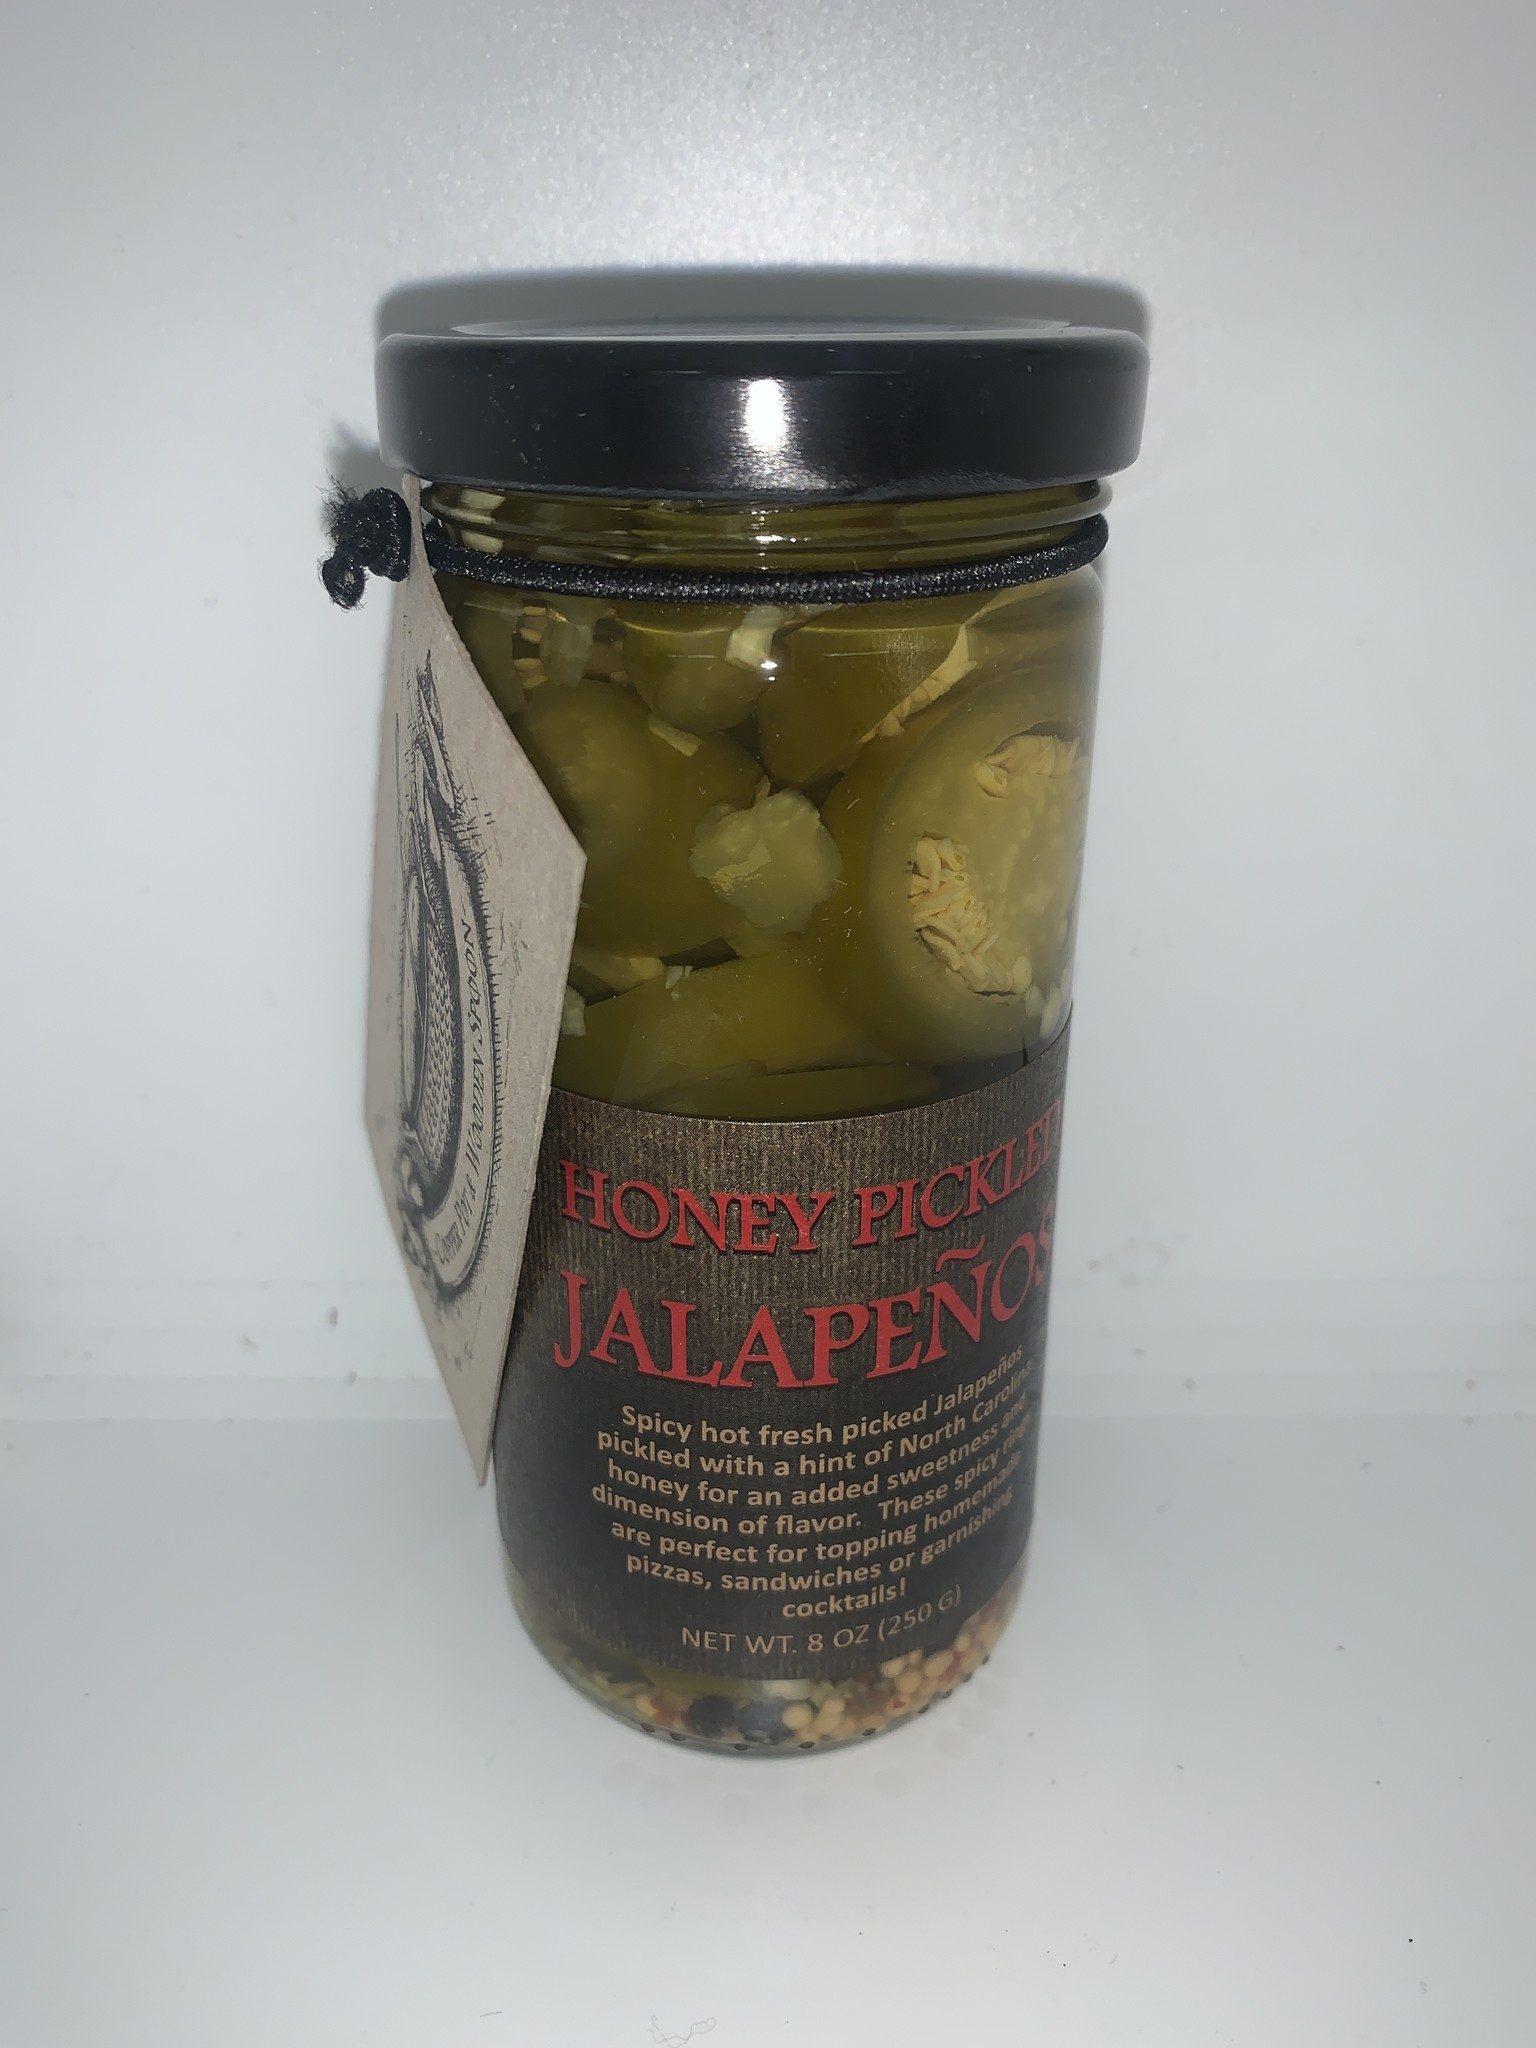 Copper Pot  & Wooden Spoon Honey Pickled Jalapeños